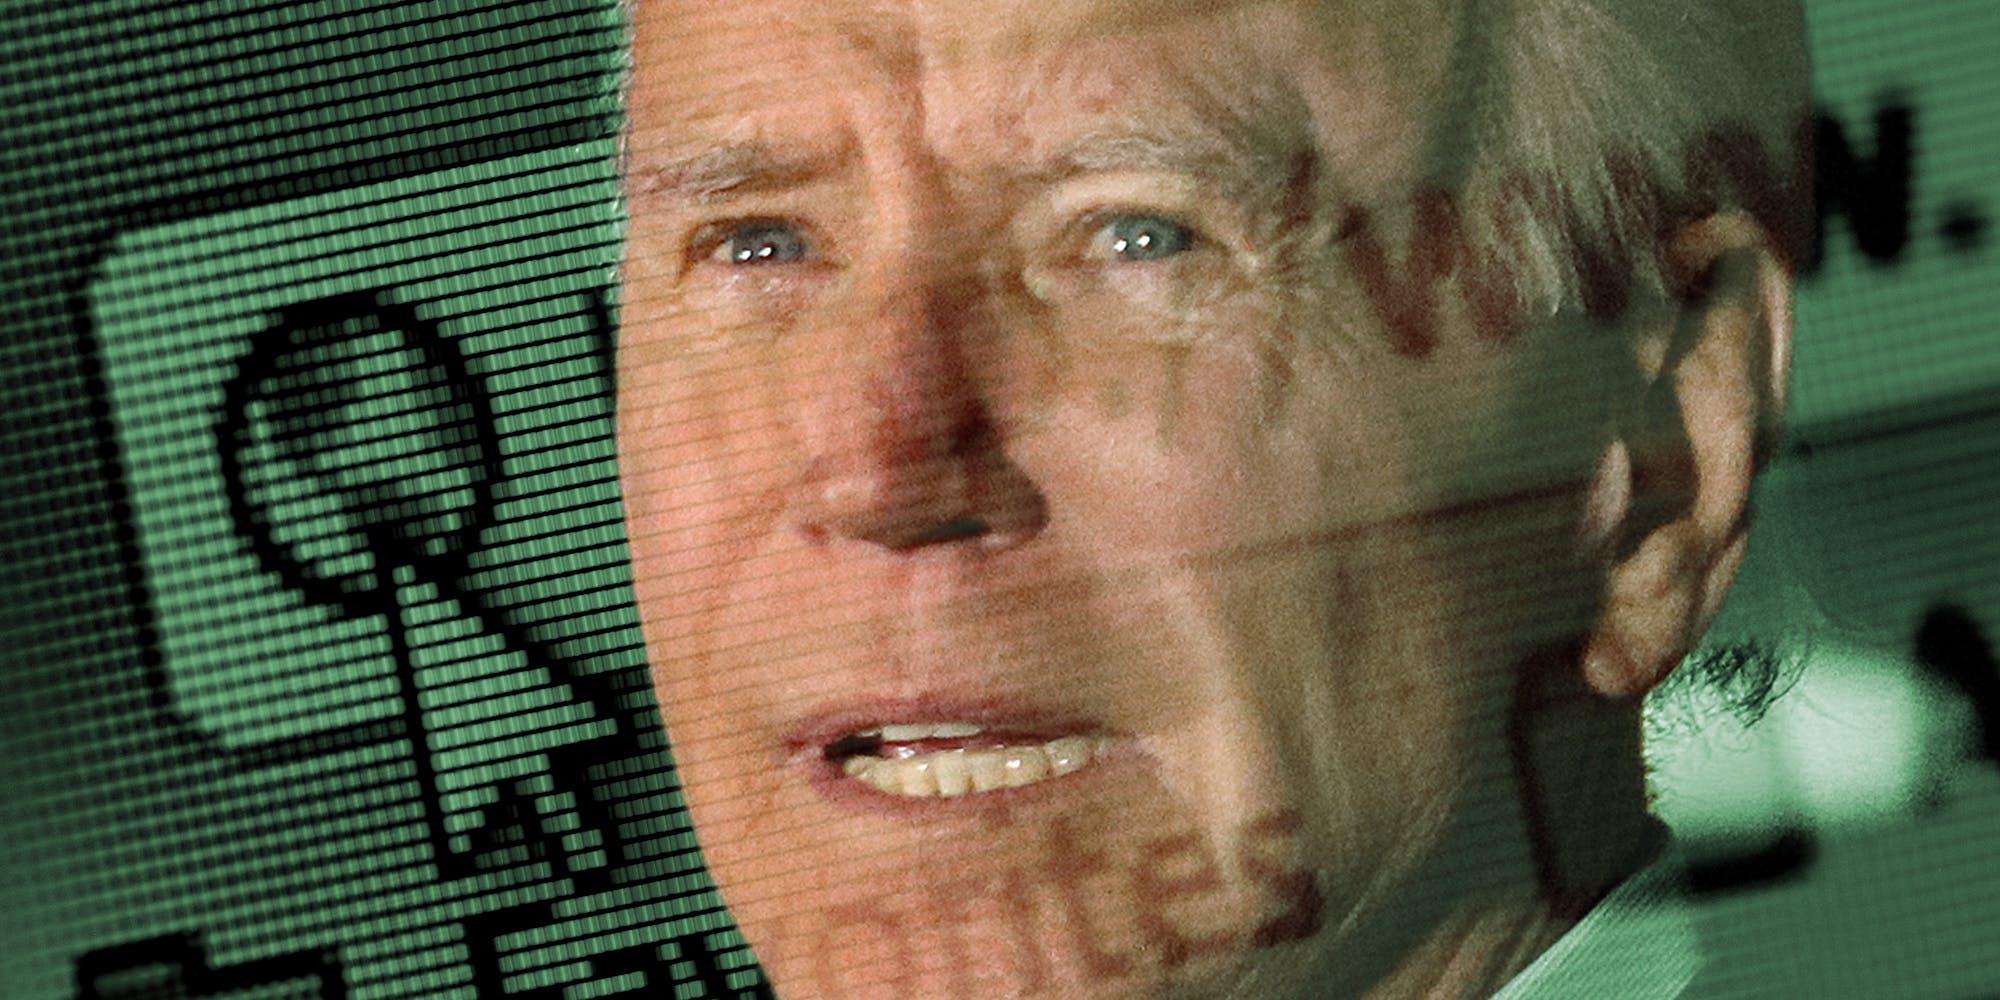 Joe Biden over internet browser background